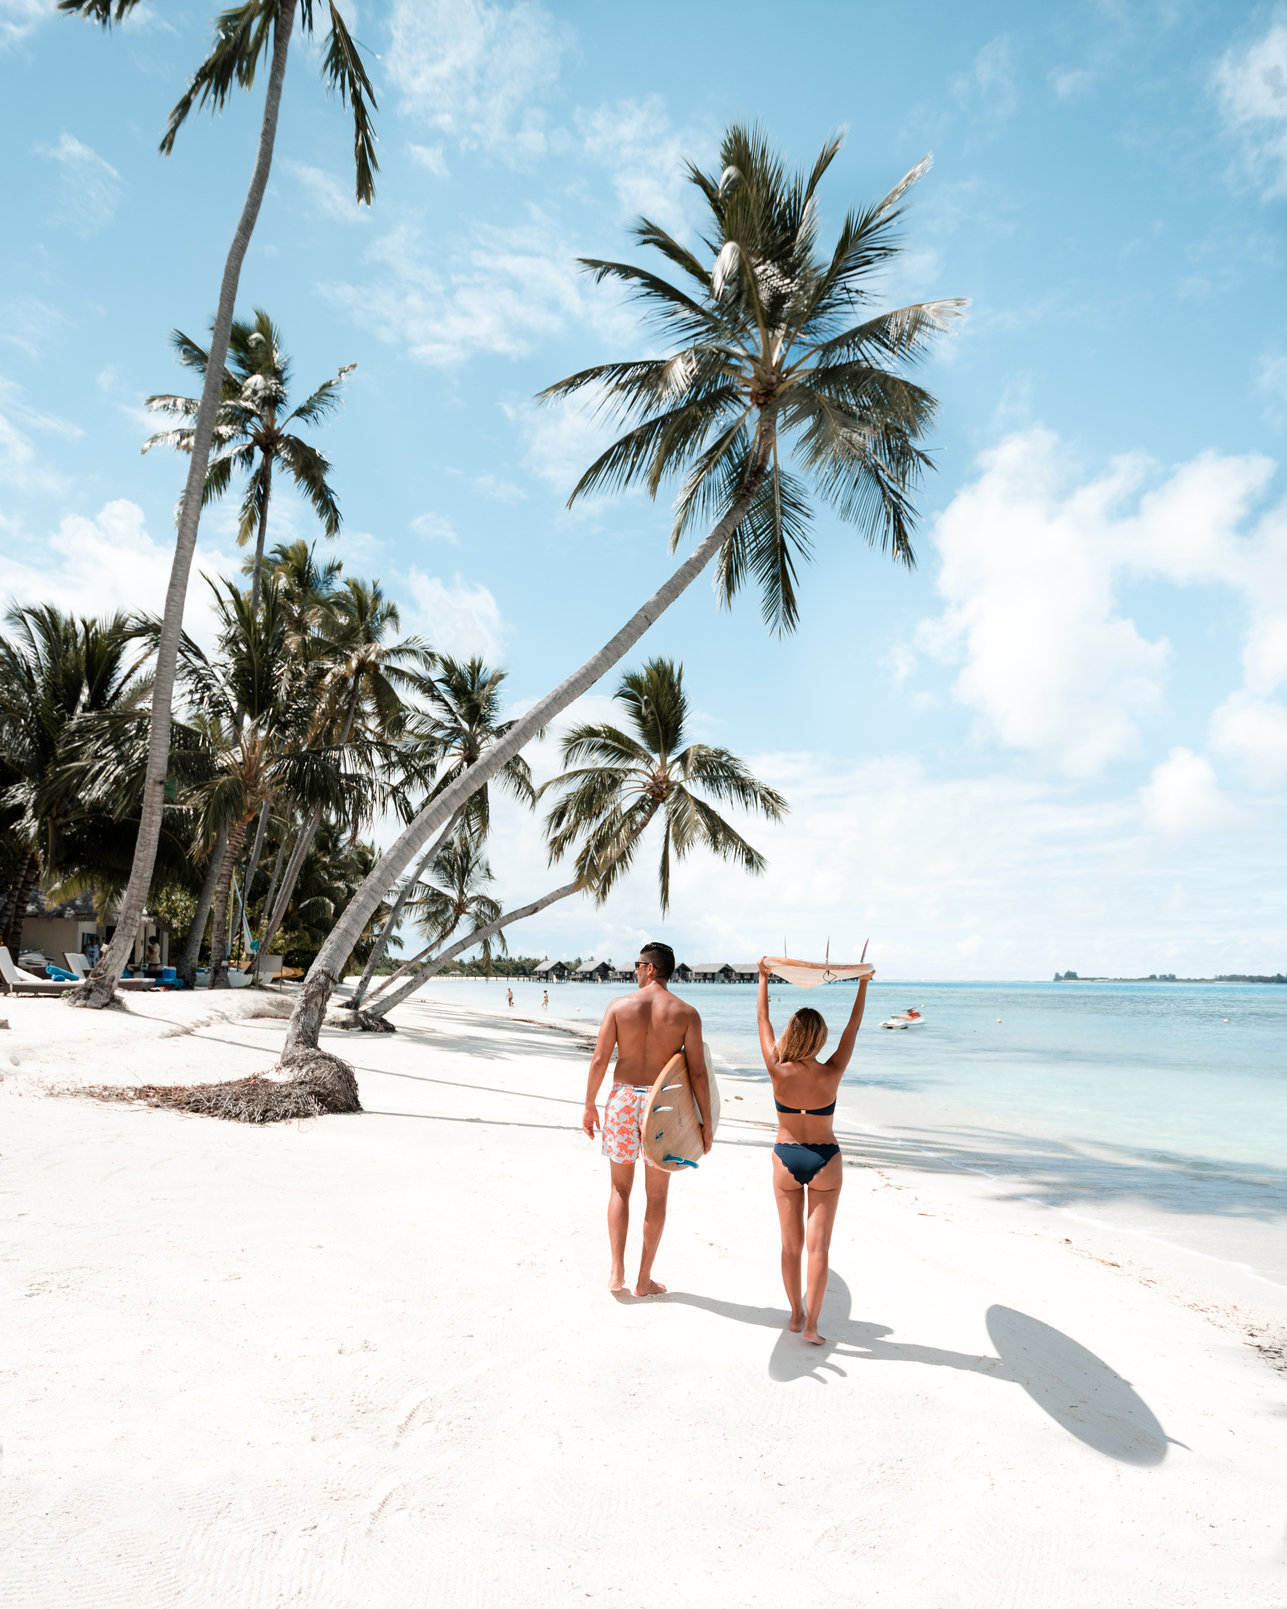 Shangri-La's Villingili Resort & Spa: Secluded Paradise South of the Equator